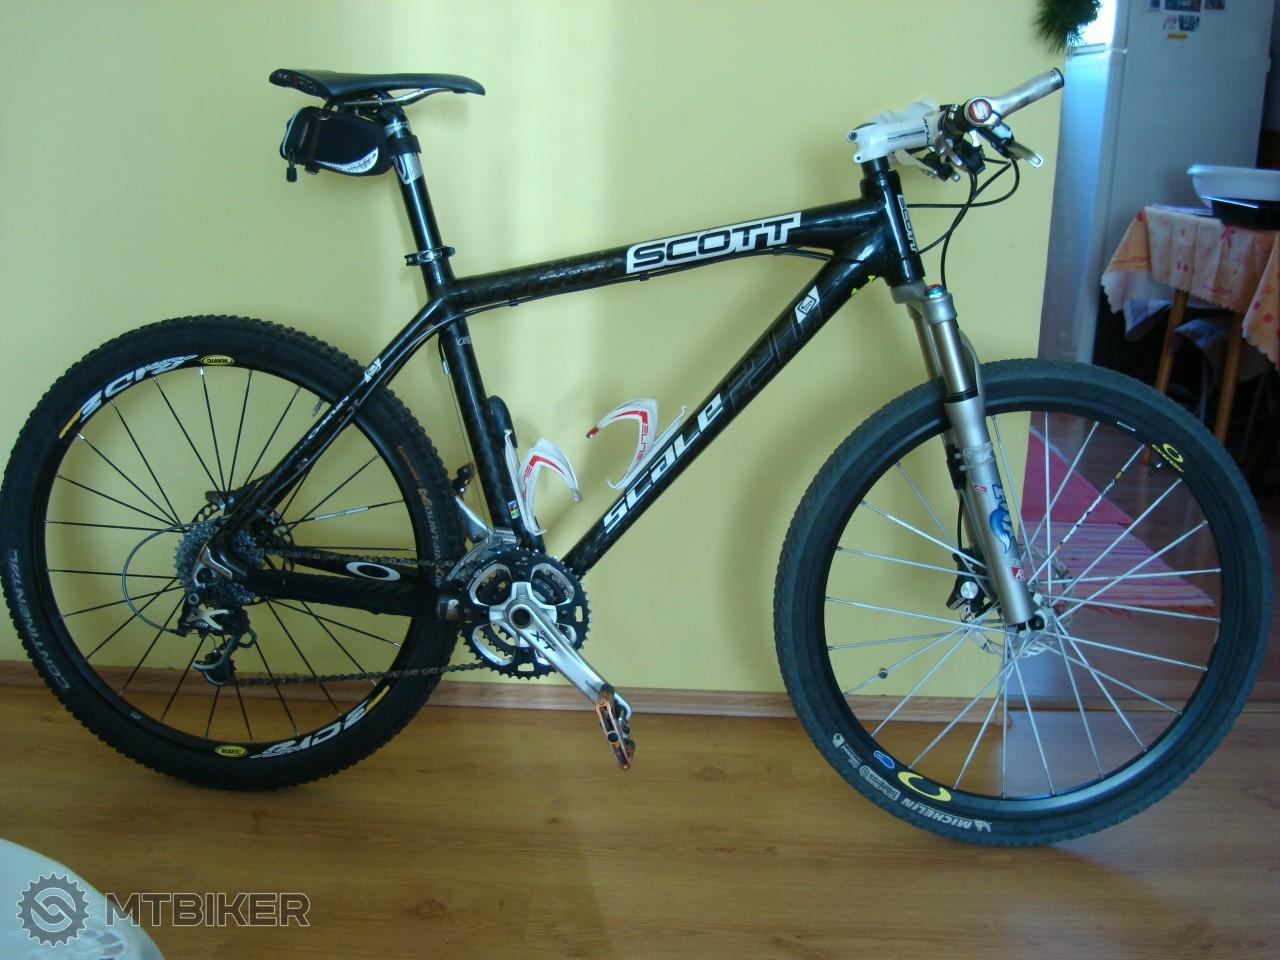 41e45f8b4 Predaj - Horský Bicykel Scott Scale 20 - Bicykle - Pevné a hardtail - Bazár  MTBIKER